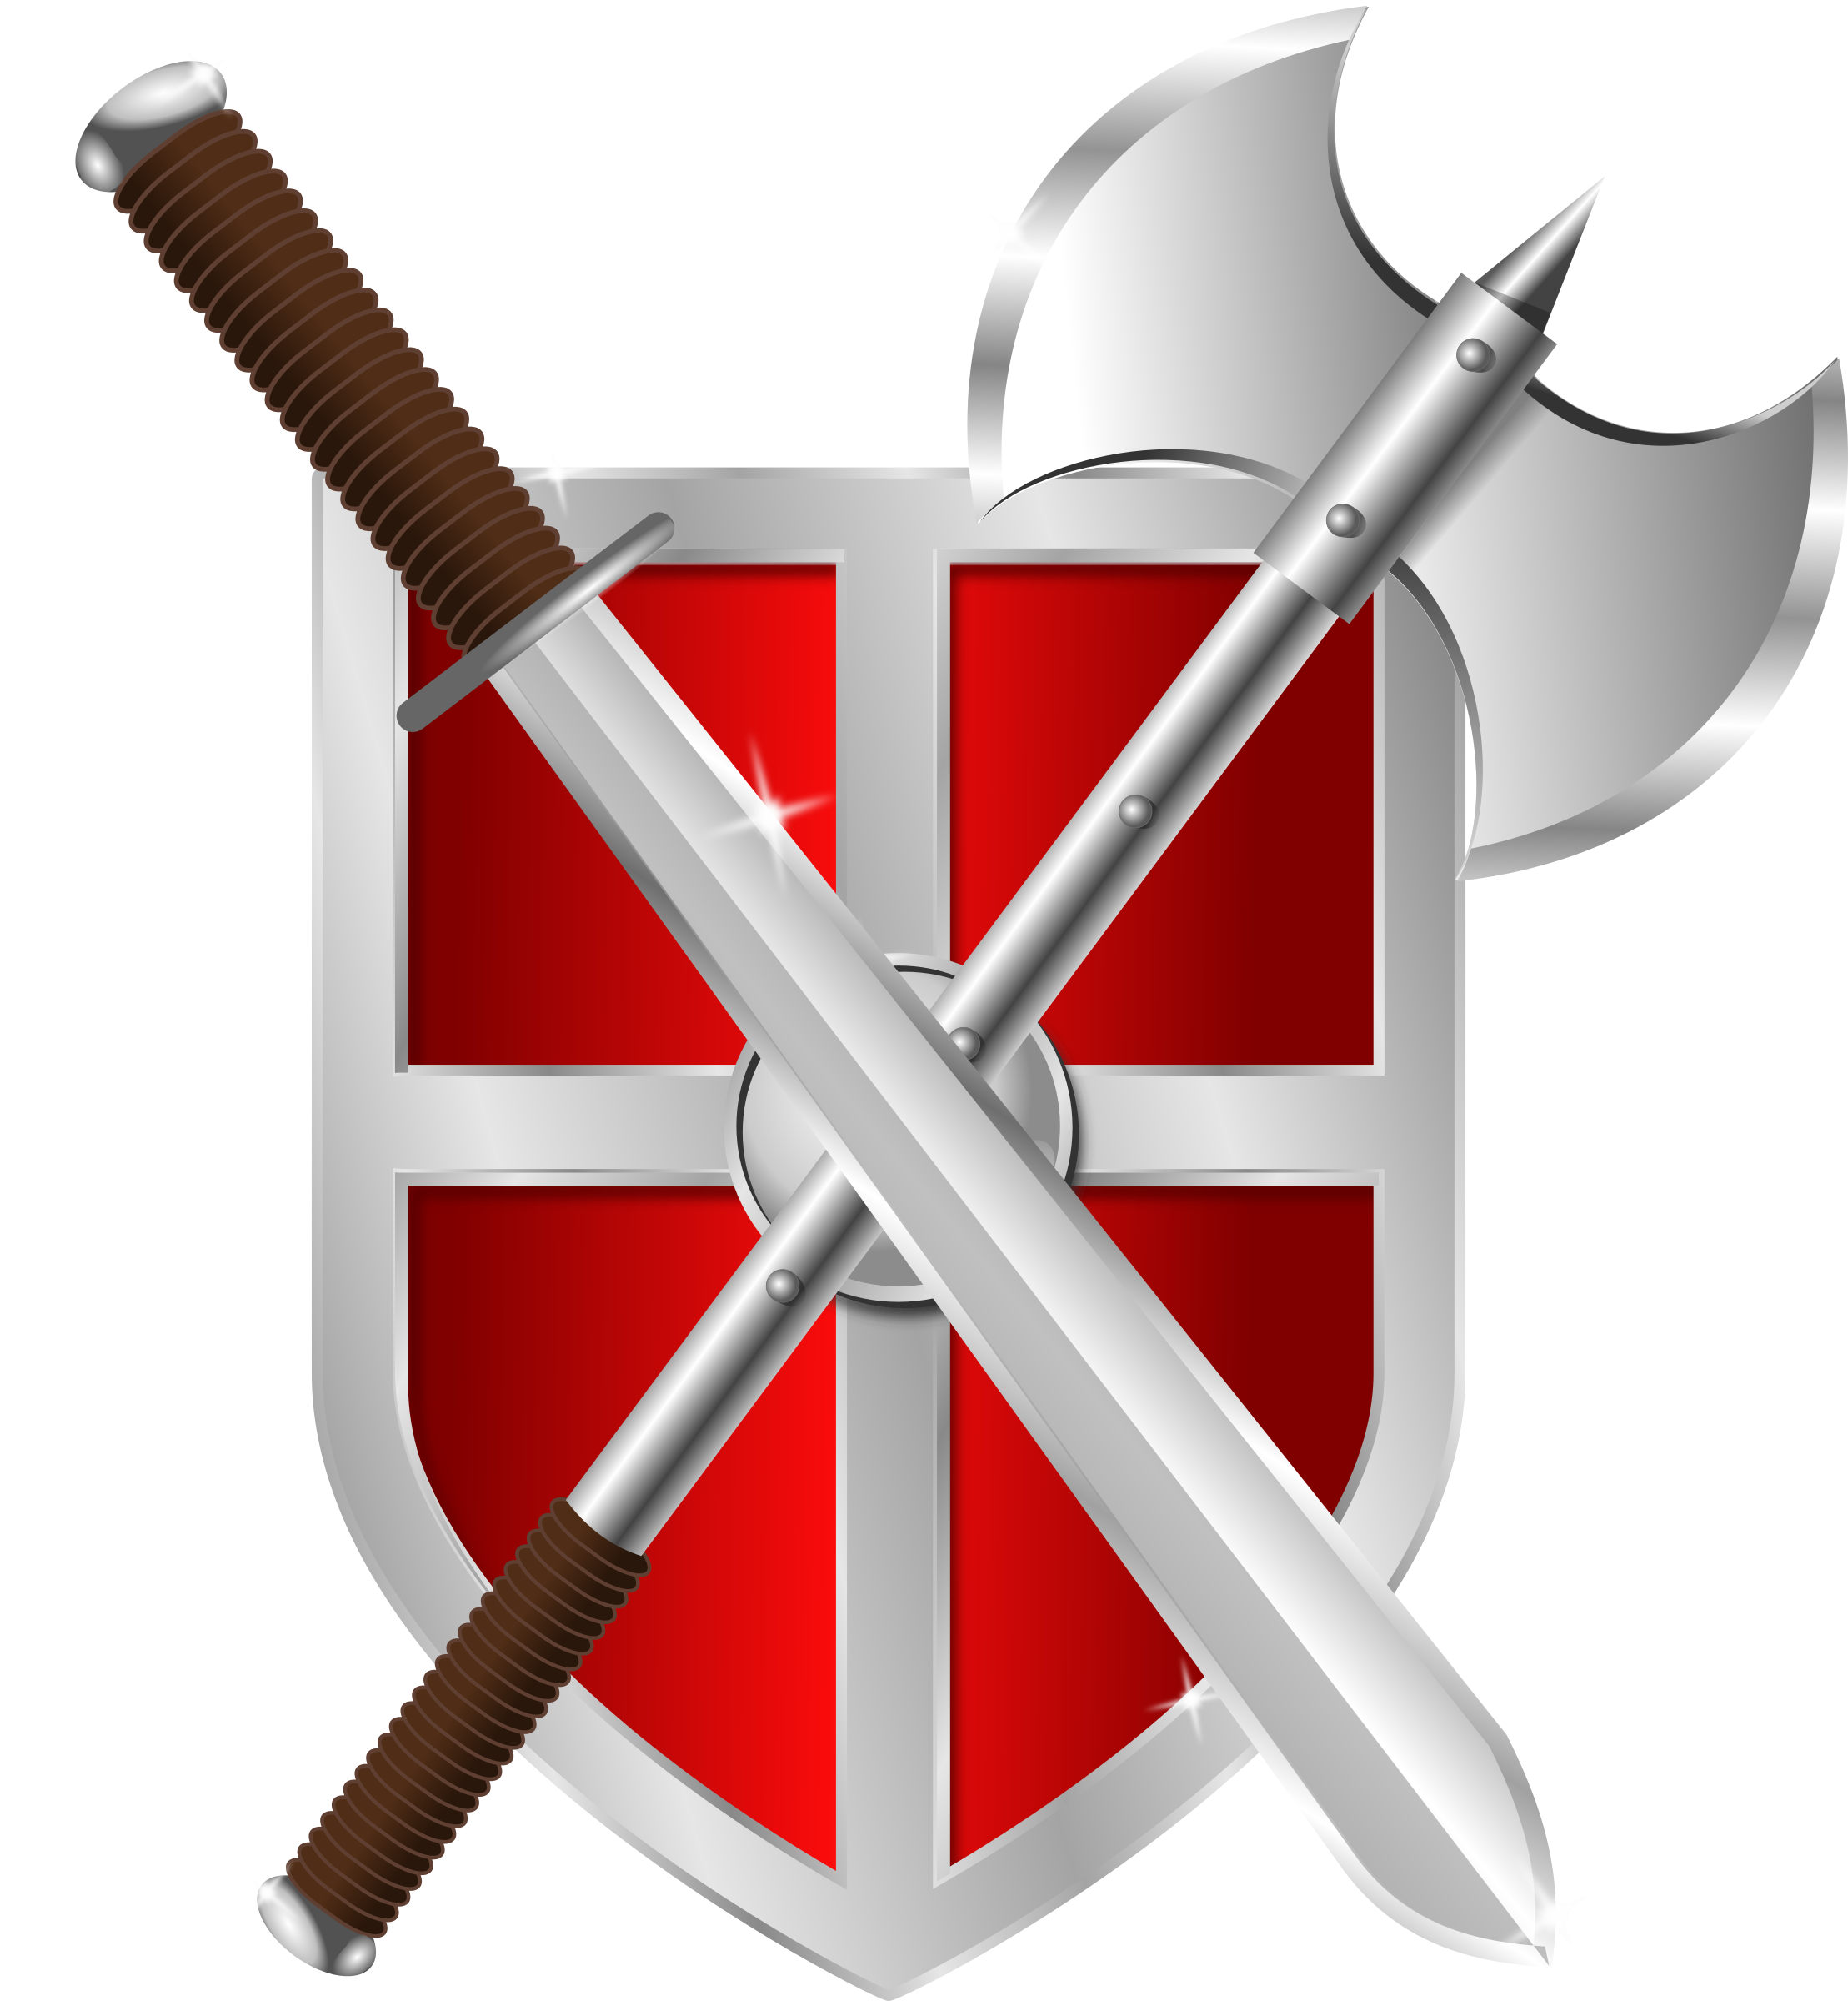 Axe clipart sword Sword shield Clipart & shield